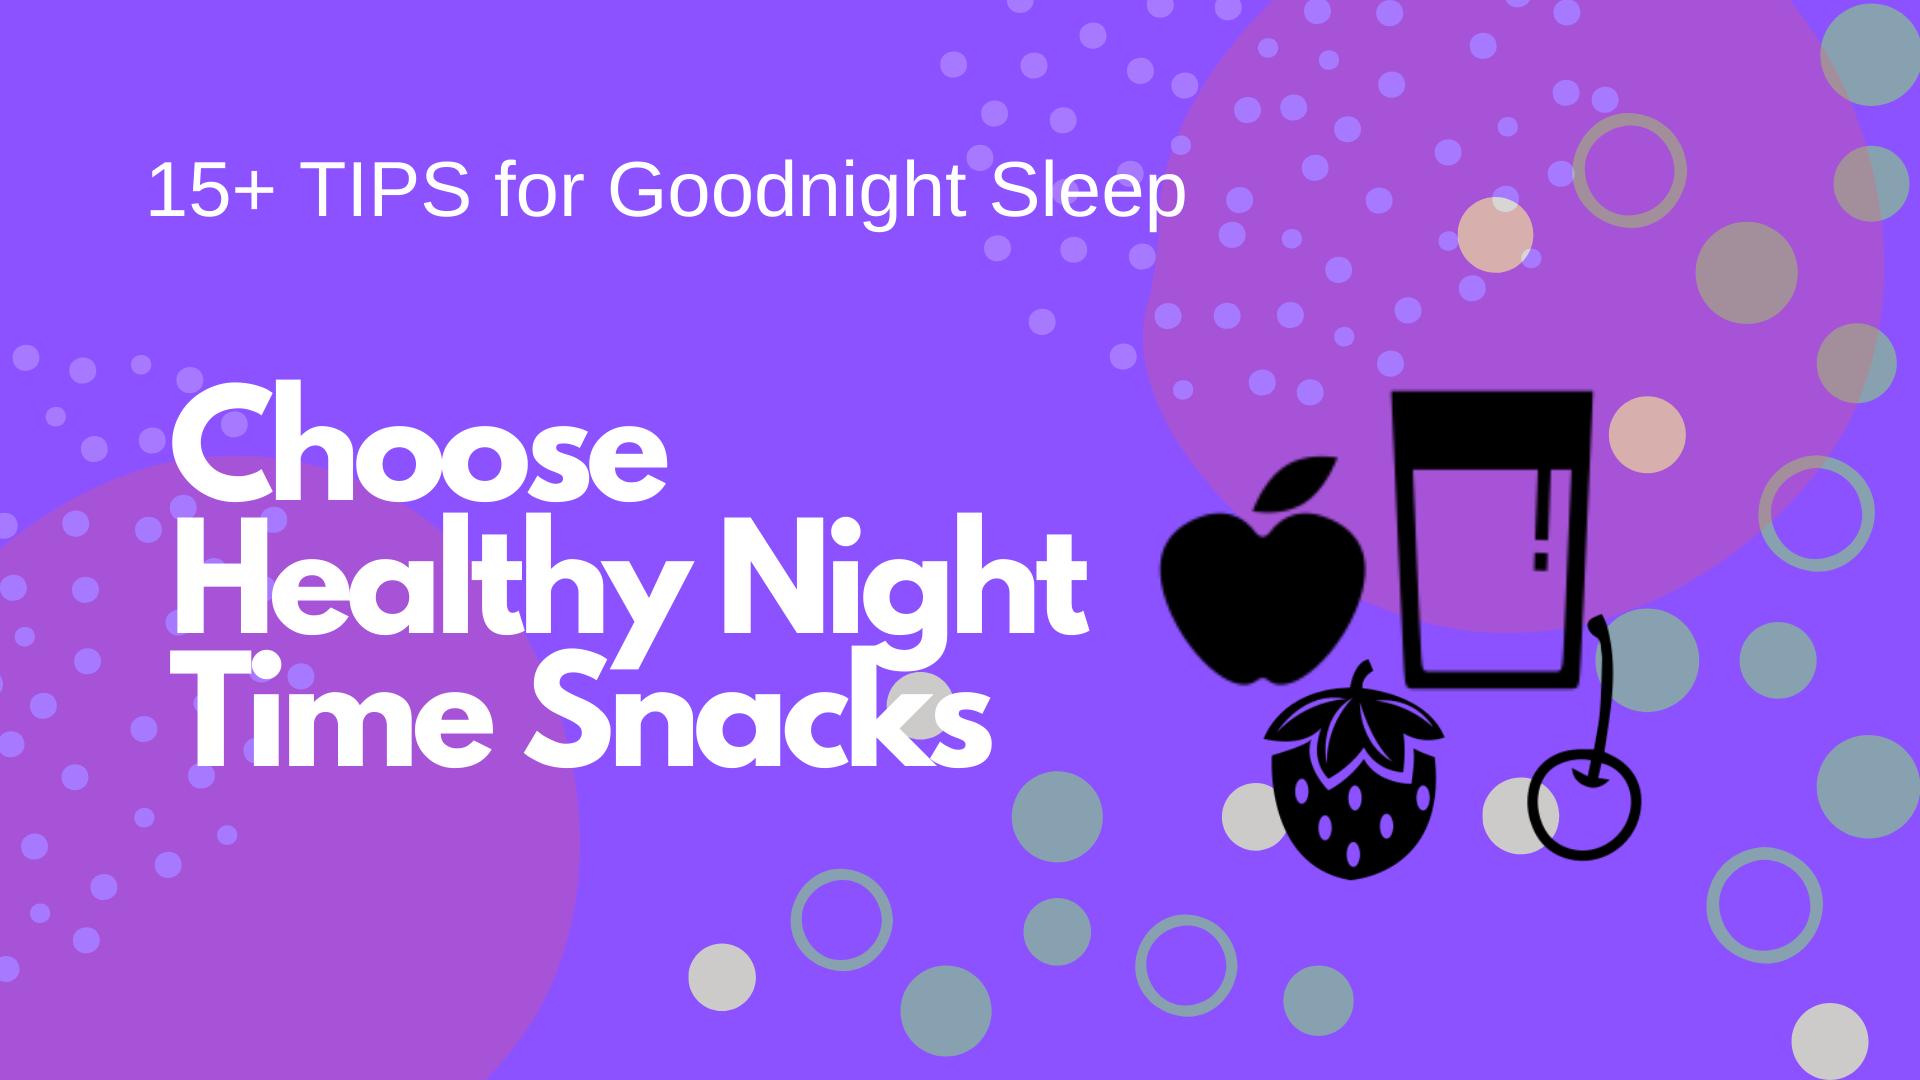 Choose Healthy Night Time Snacks